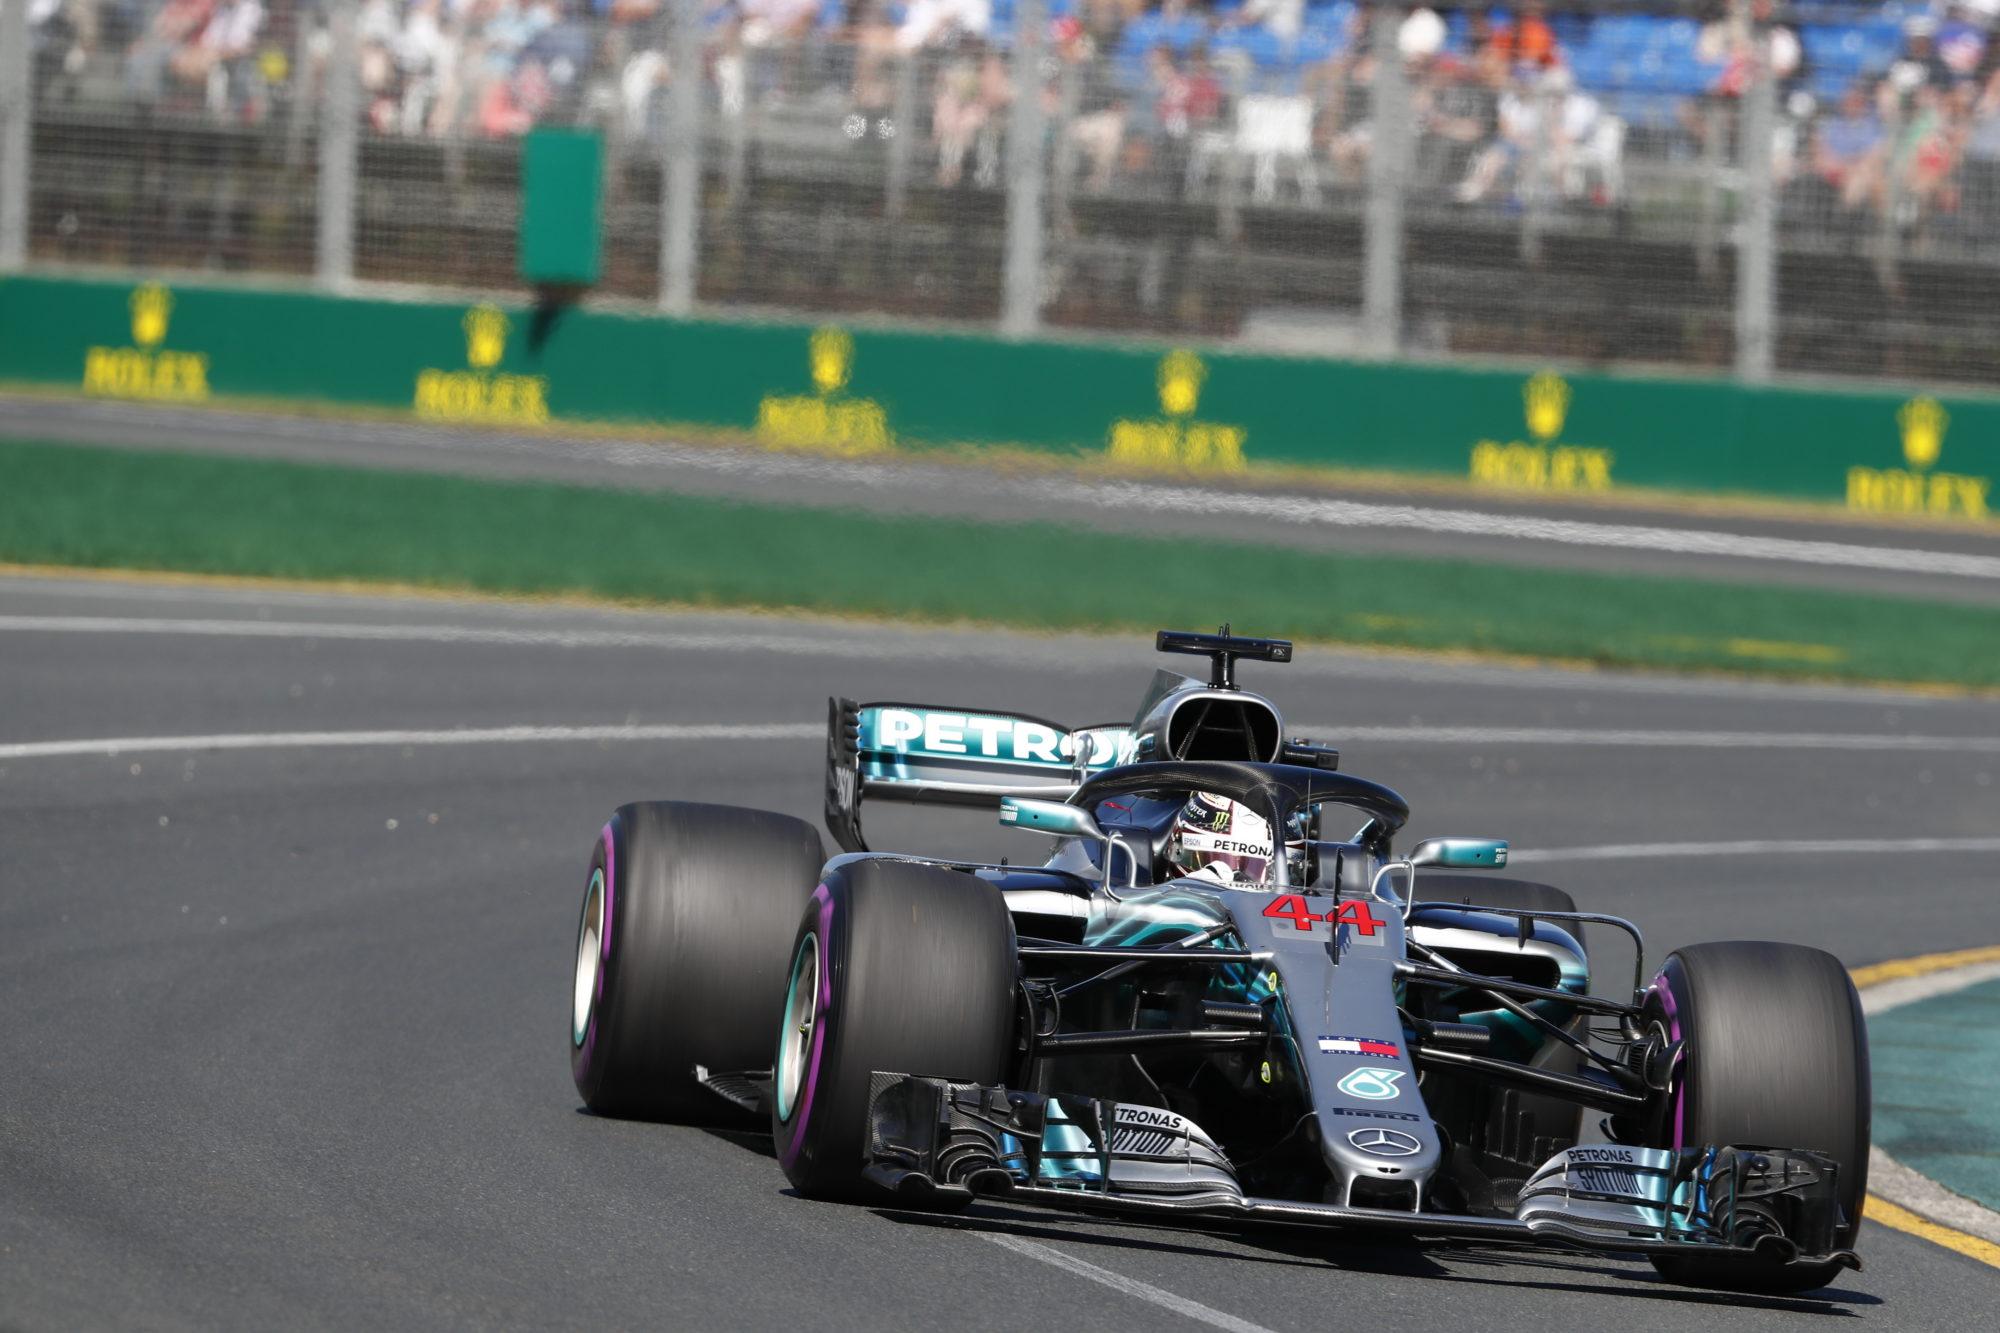 Grande Prémio da Austrália de F1 2018